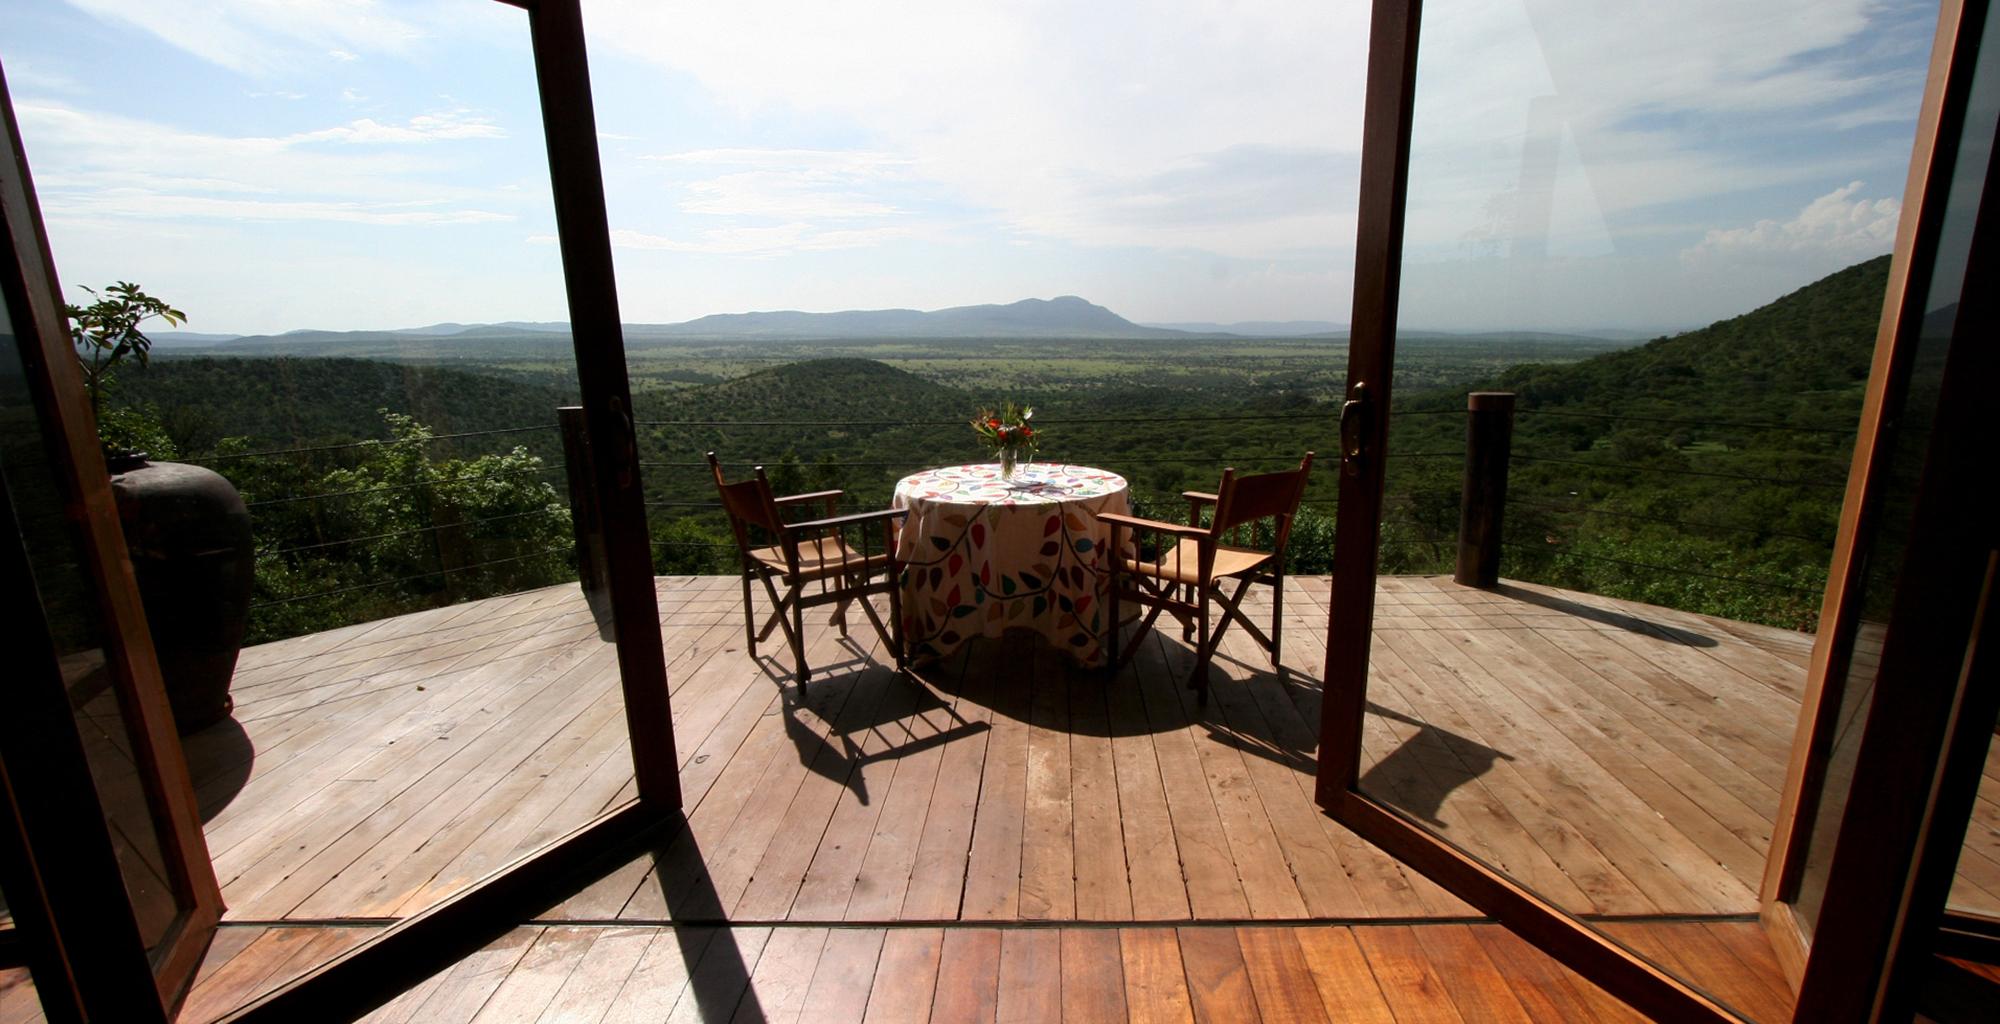 Kenya-Cottars-Private-House-Deck